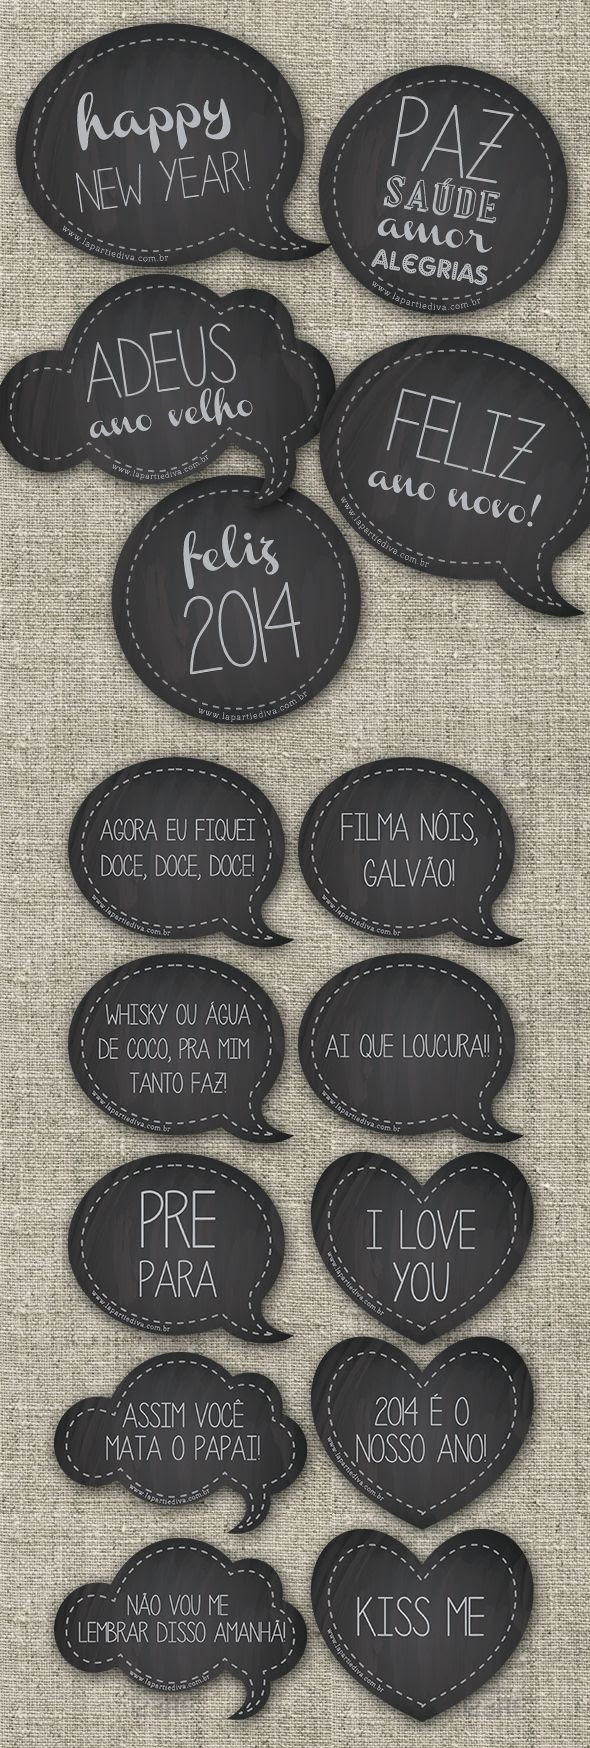 plaquinhas divertidas para ano novo, photobooth, happy new year, chalckboar, free download, 2014, new year - www.lapartiediva.com.br